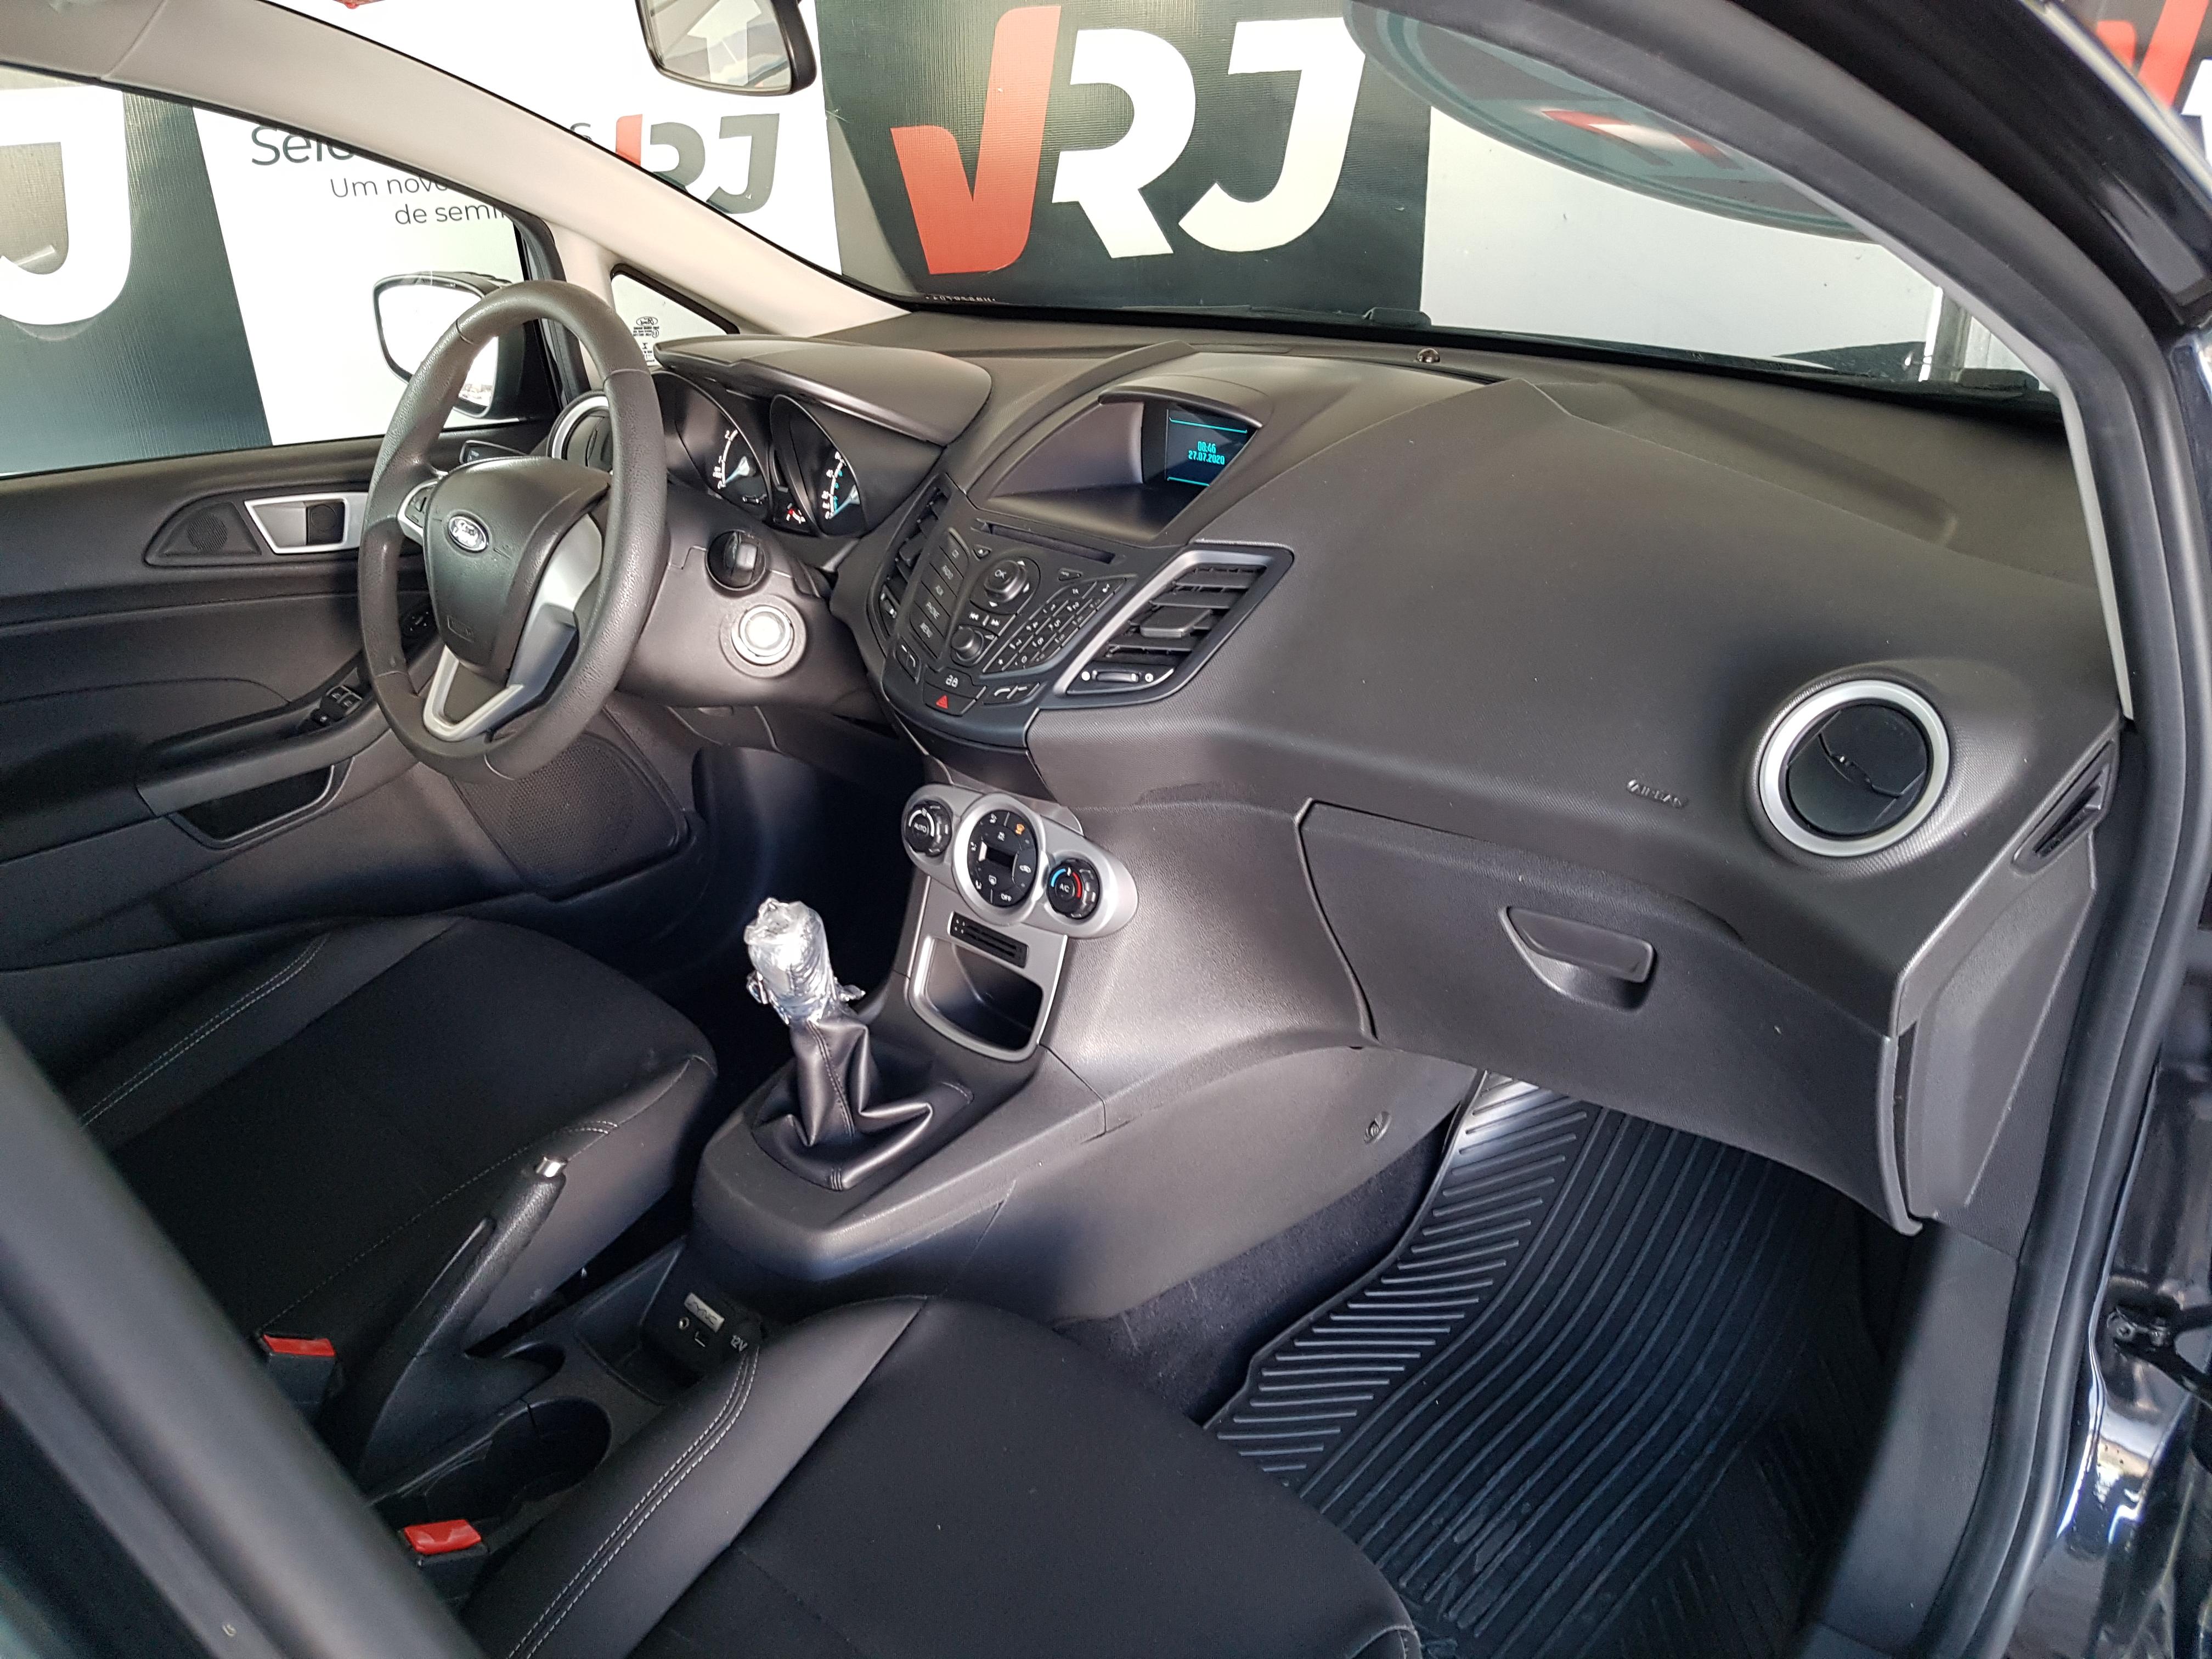 Ford FIESTA Fiesta SEL 1.6 16V Flex Mec. 5p